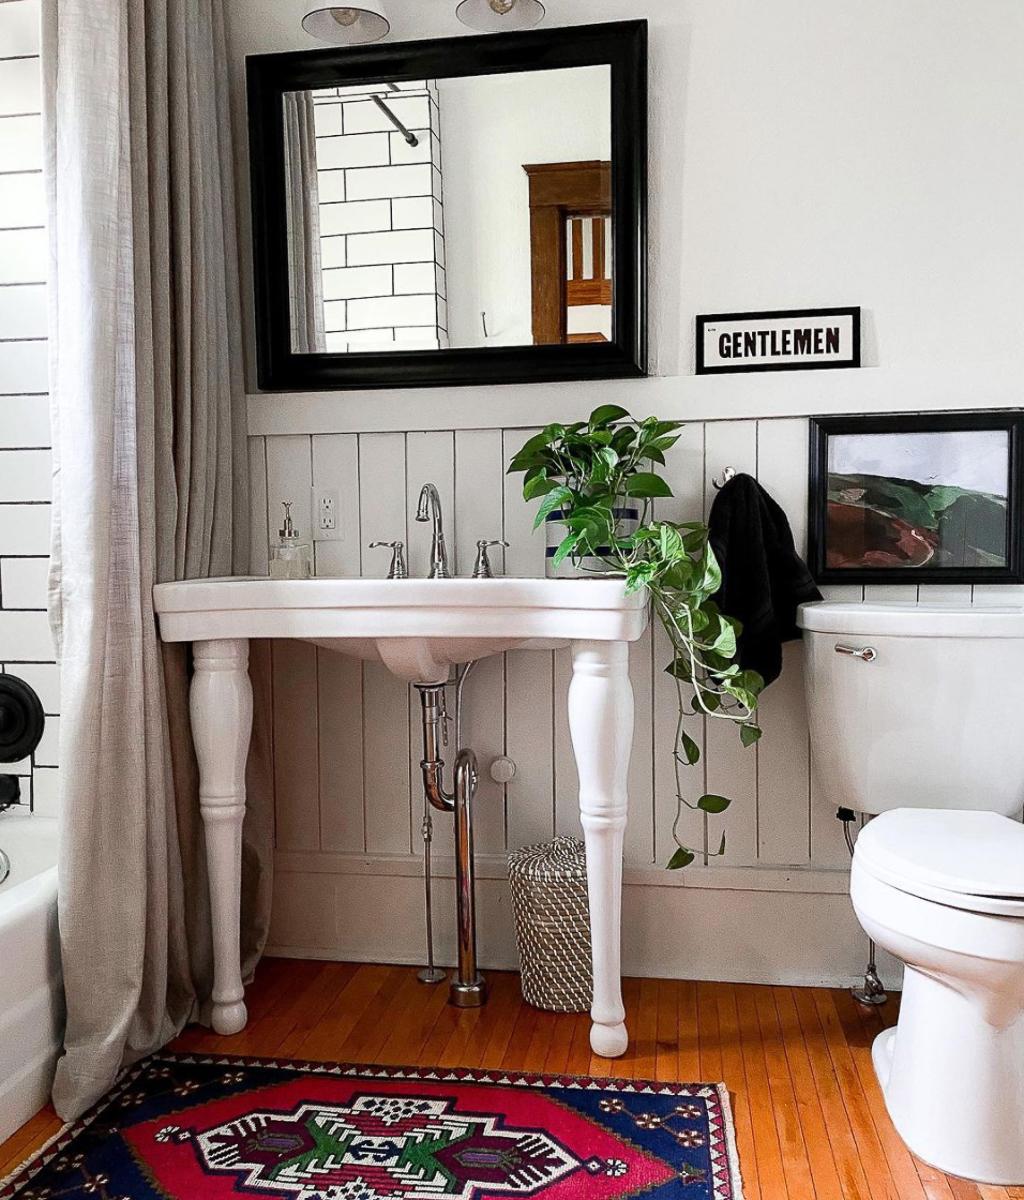 Love the freestanding sink in this charming vintage bathroom kellyelko.com